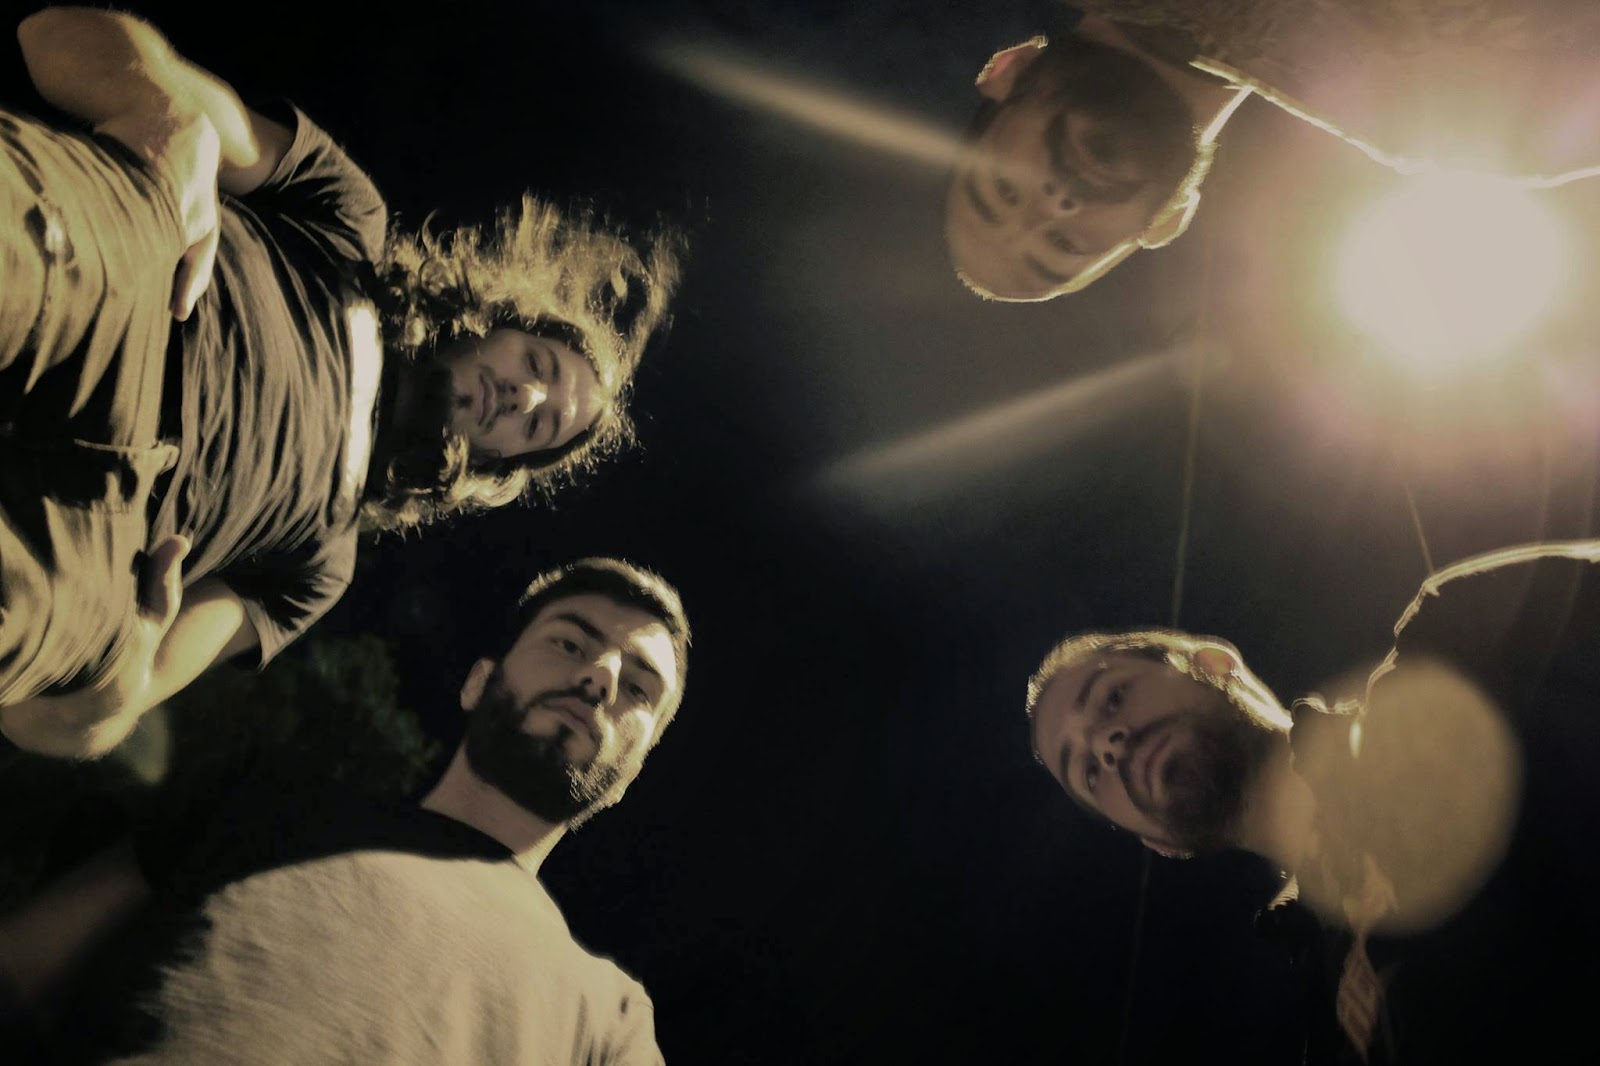 amniac band photo